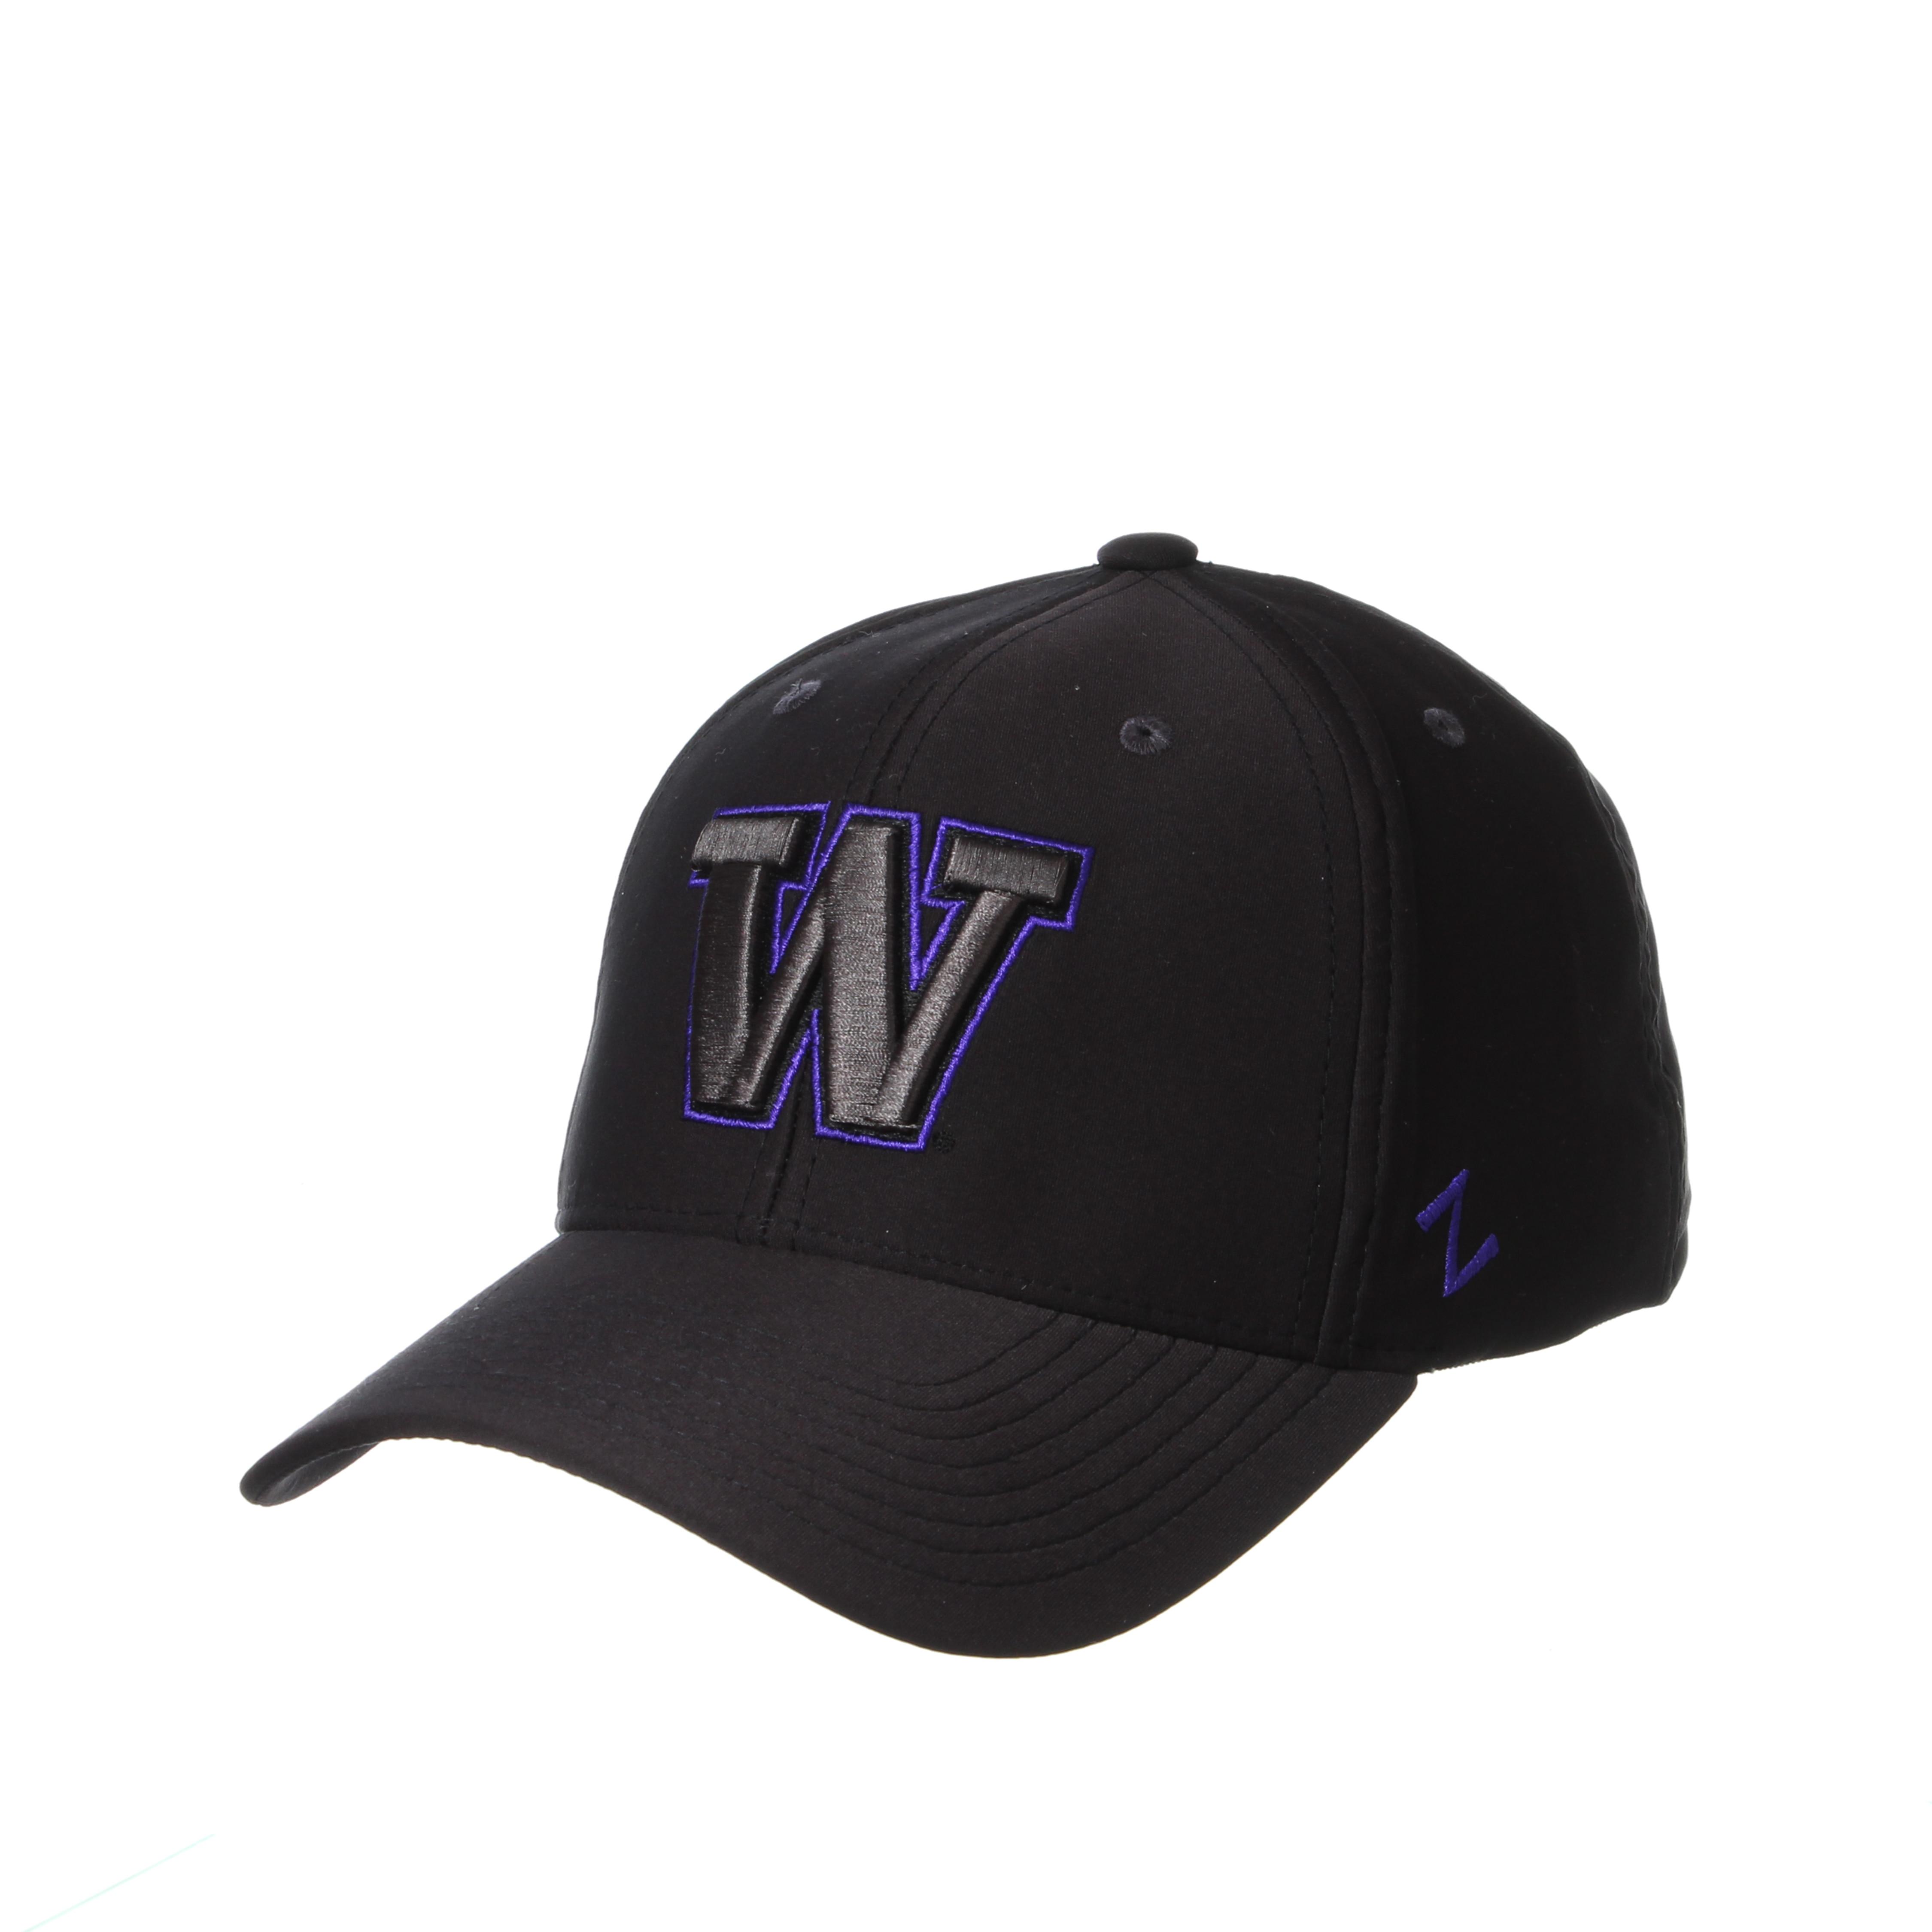 Washington Huskies Zephyr Phoenix Structured Curved Bill Stretch Fit Cap Hat